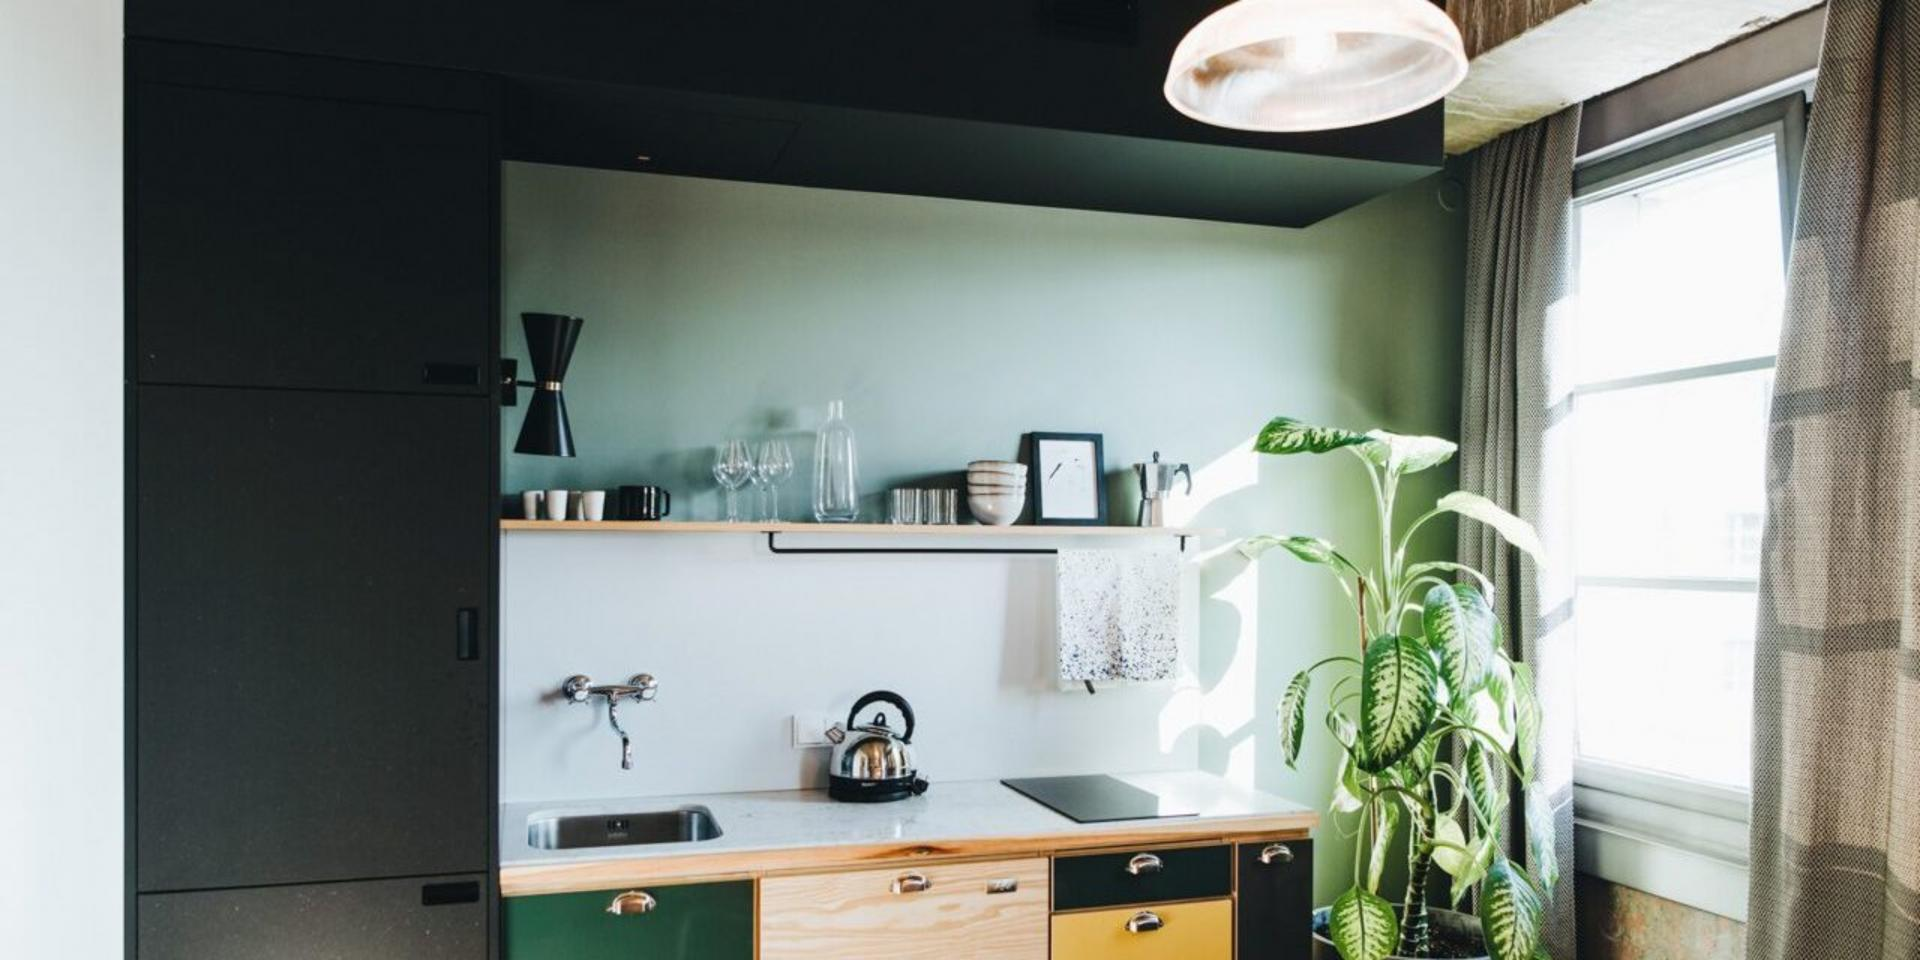 Warschau - Furnished studio in Berlin for expats